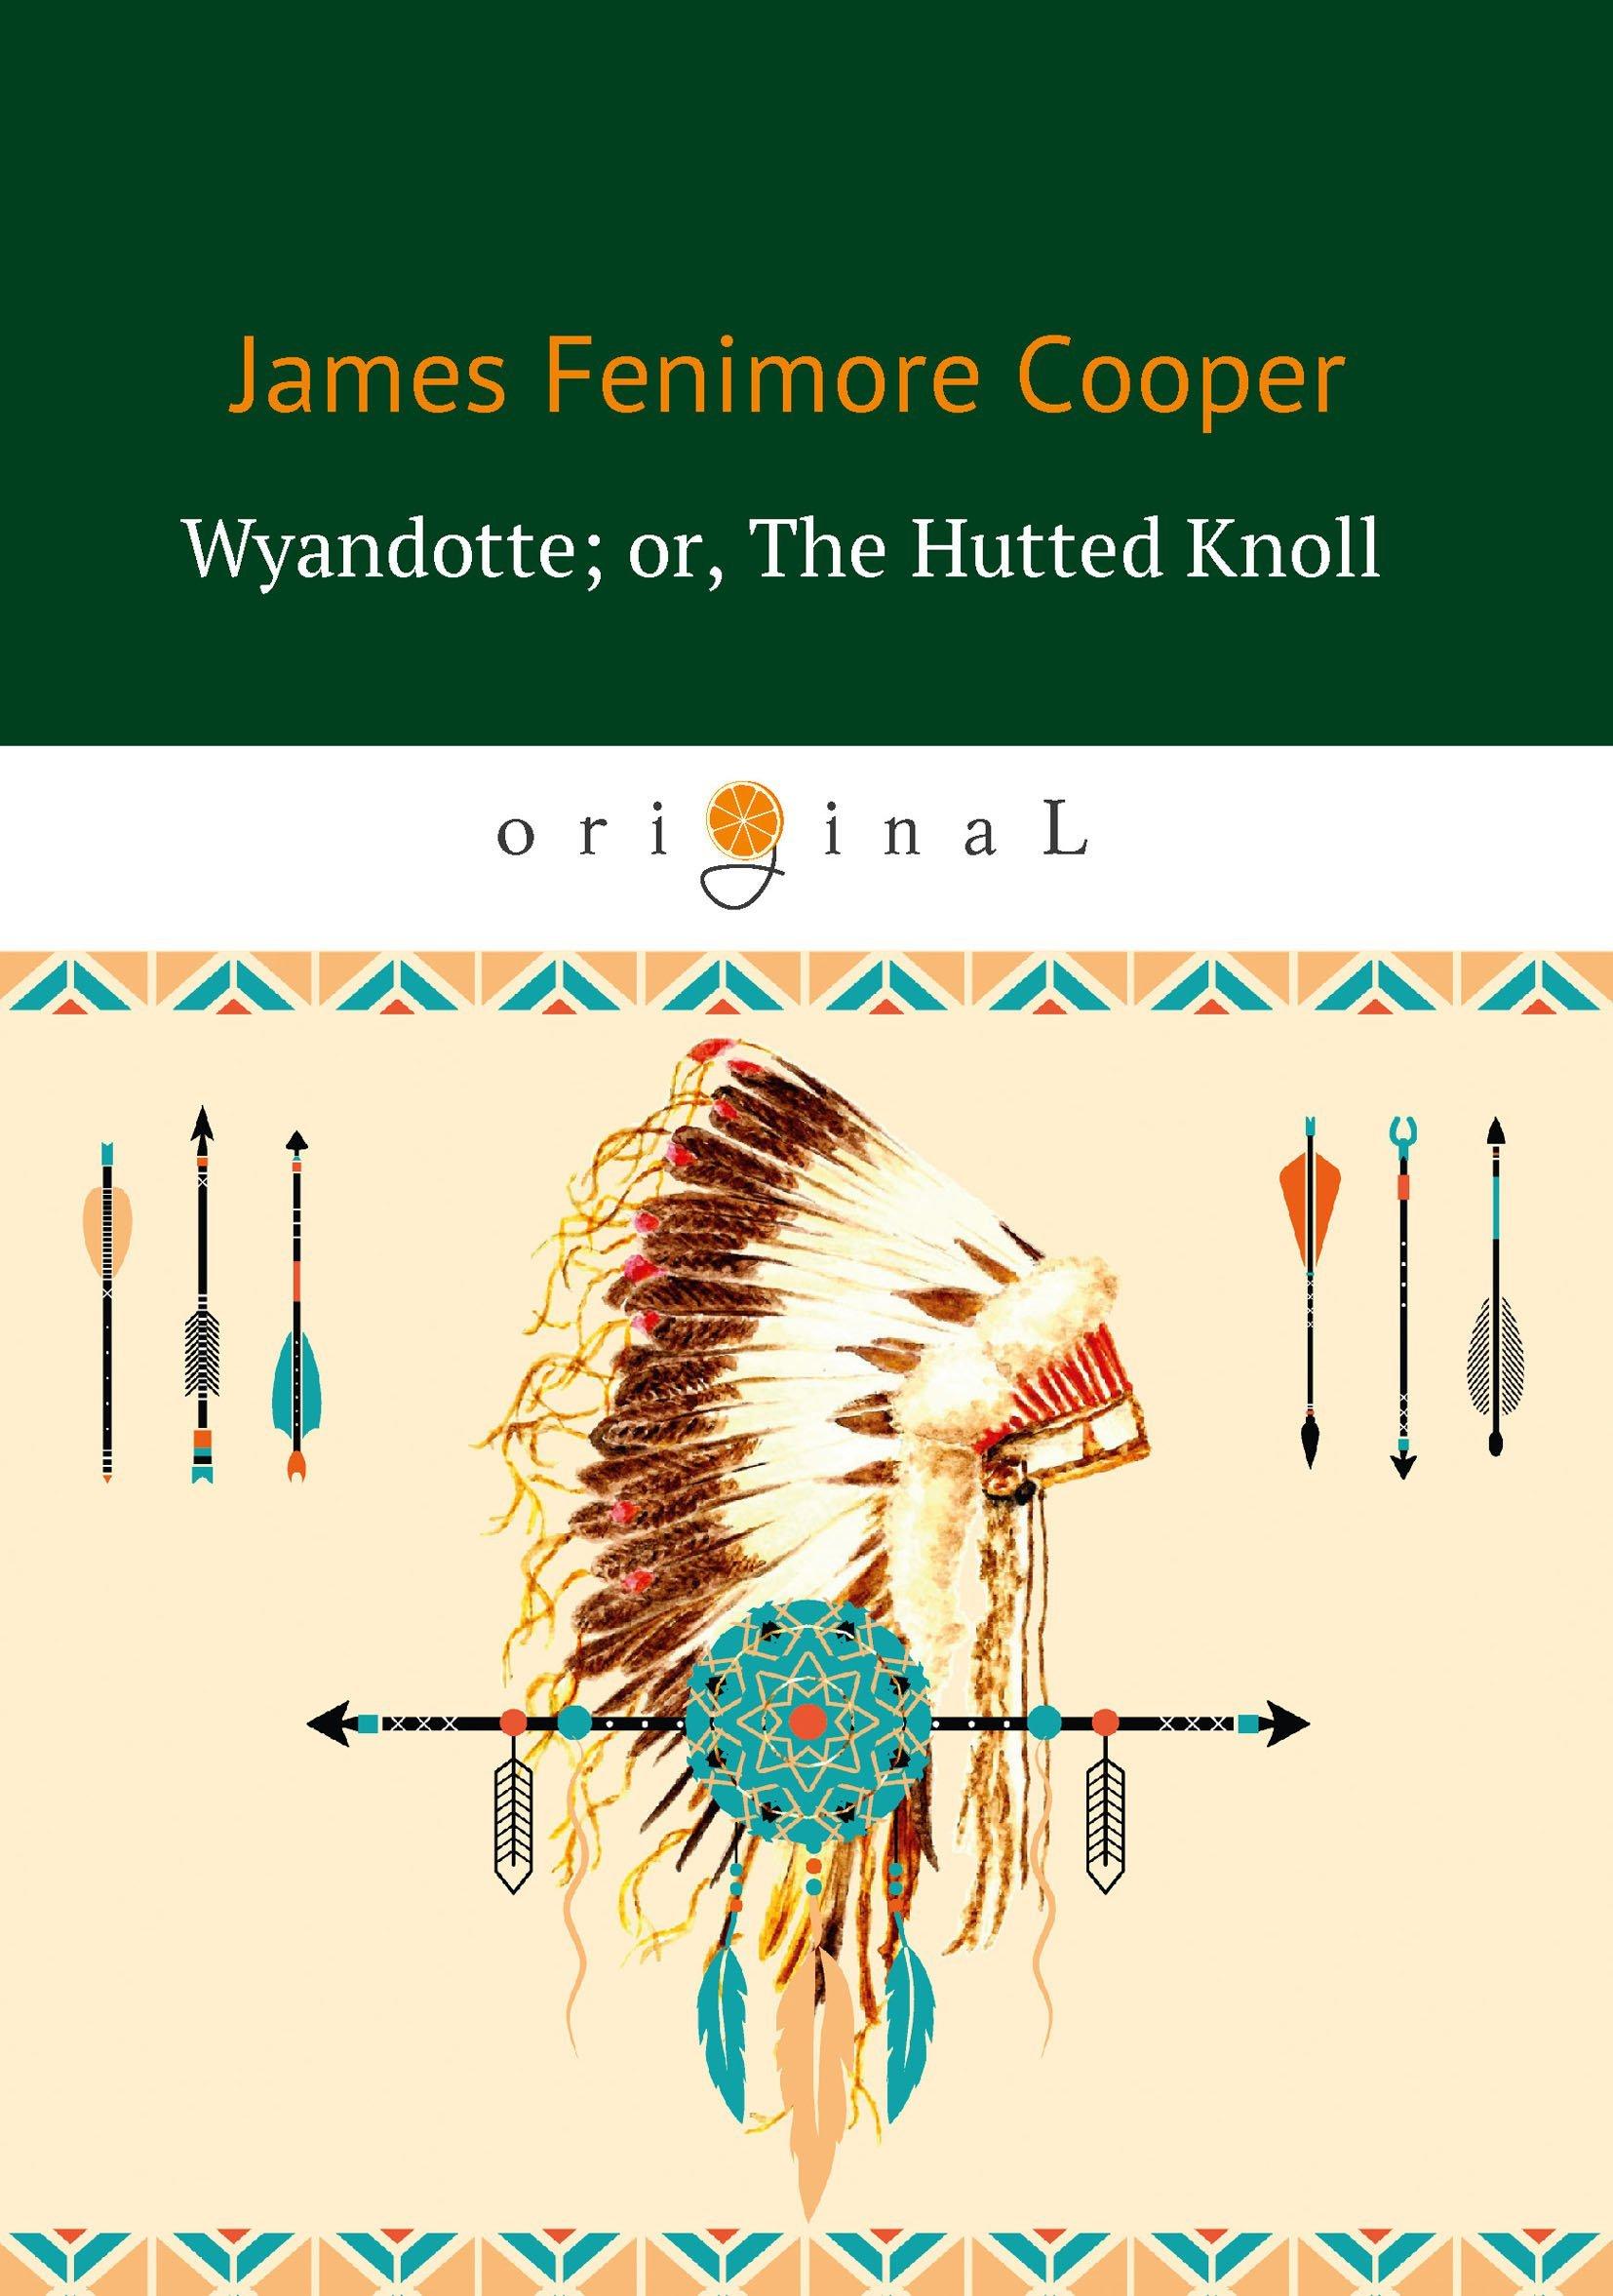 Фото - Купер Джеймс Фенимор Wyandotte; or, The Hutted Knoll = Вайандотте, или Дом на холме: на англ.яз knoll